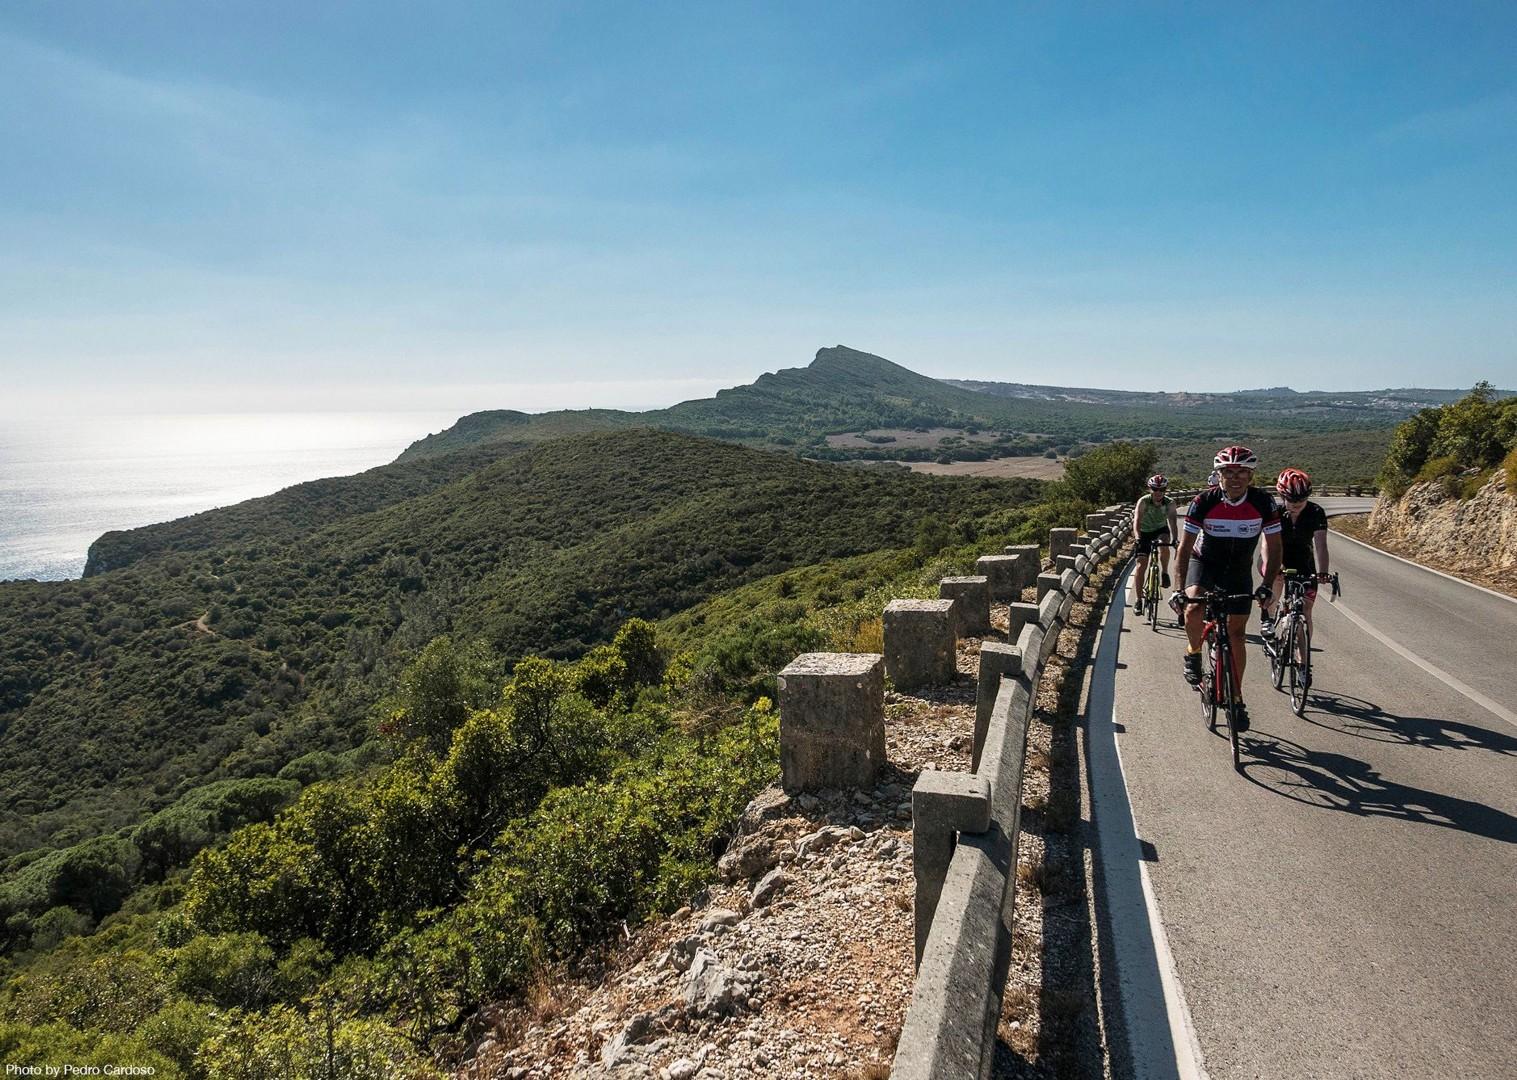 road-cycling-guides-portugal.jpg - Portugal - Atlantic Escape - Guided Road Cycling Holiday - Road Cycling